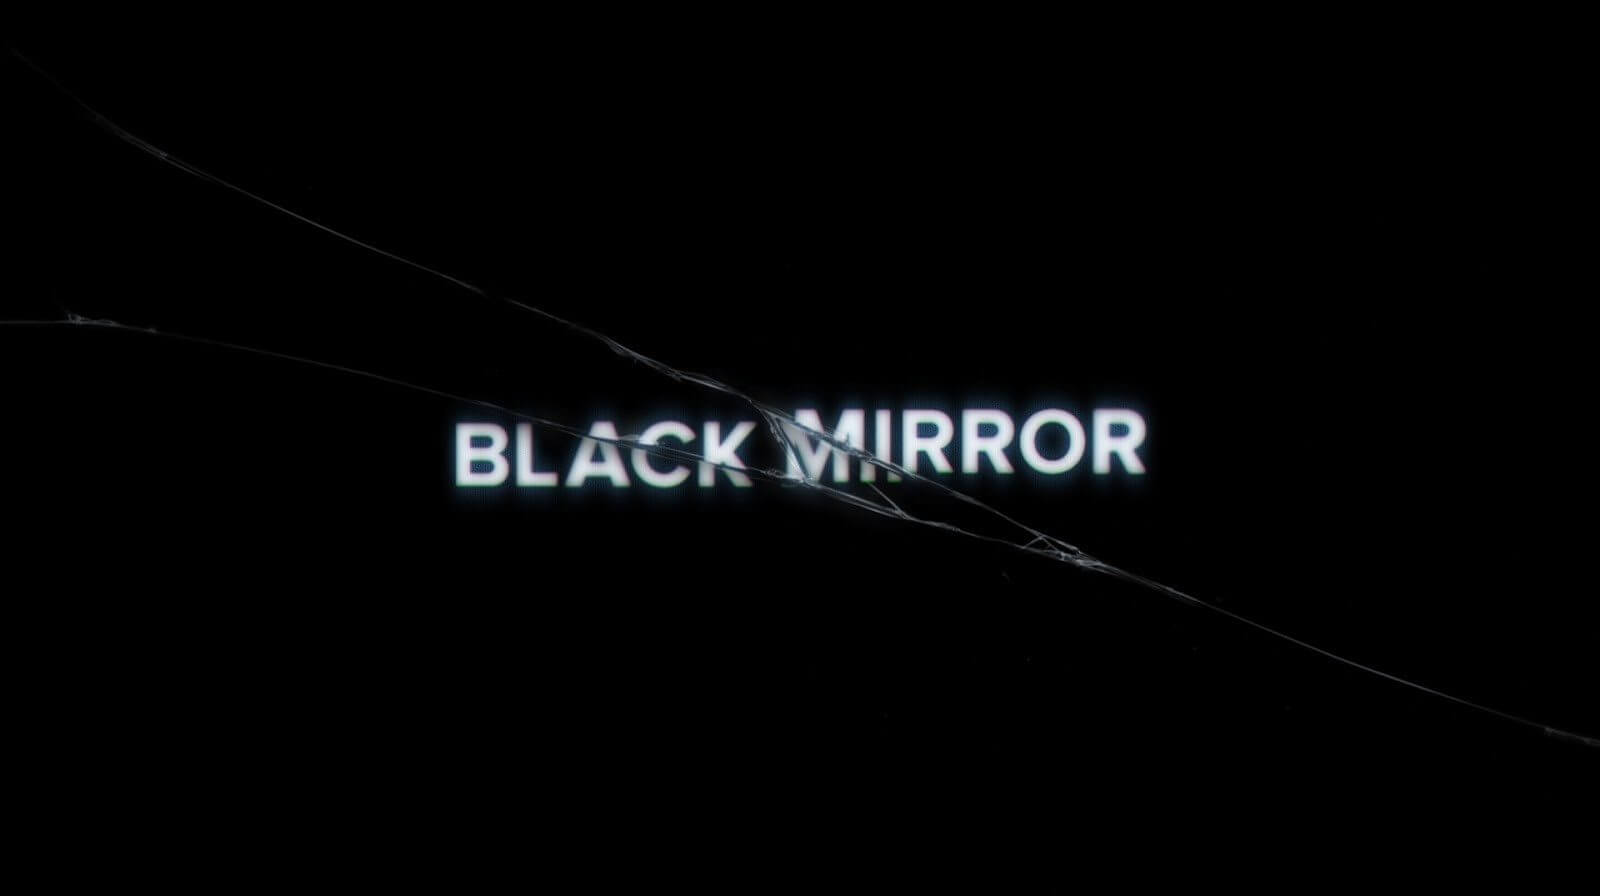 Black mirror1